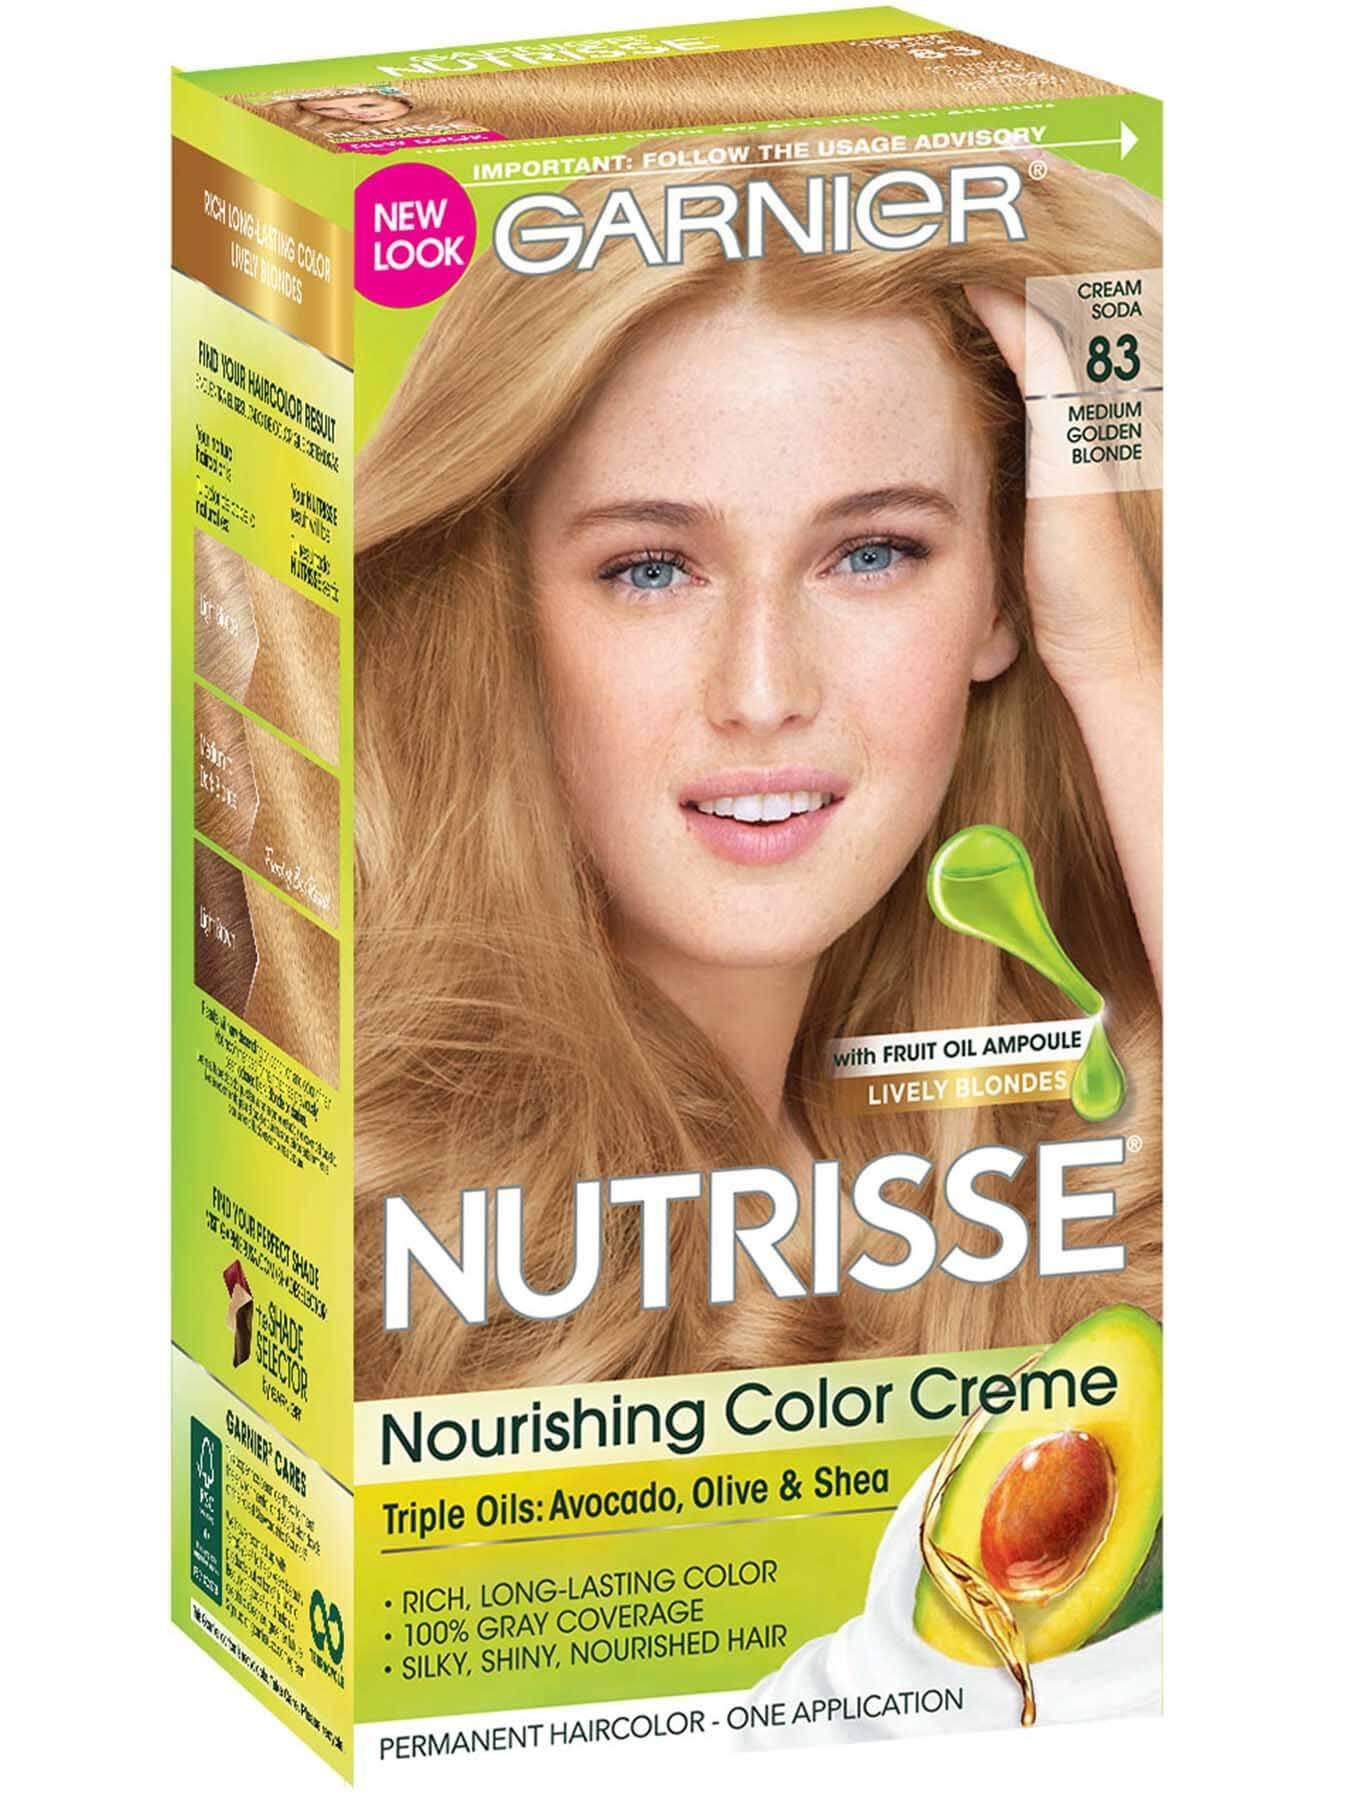 Nutrisse Nourishing Color Creme Medium Golden Blonde 83 Garnier